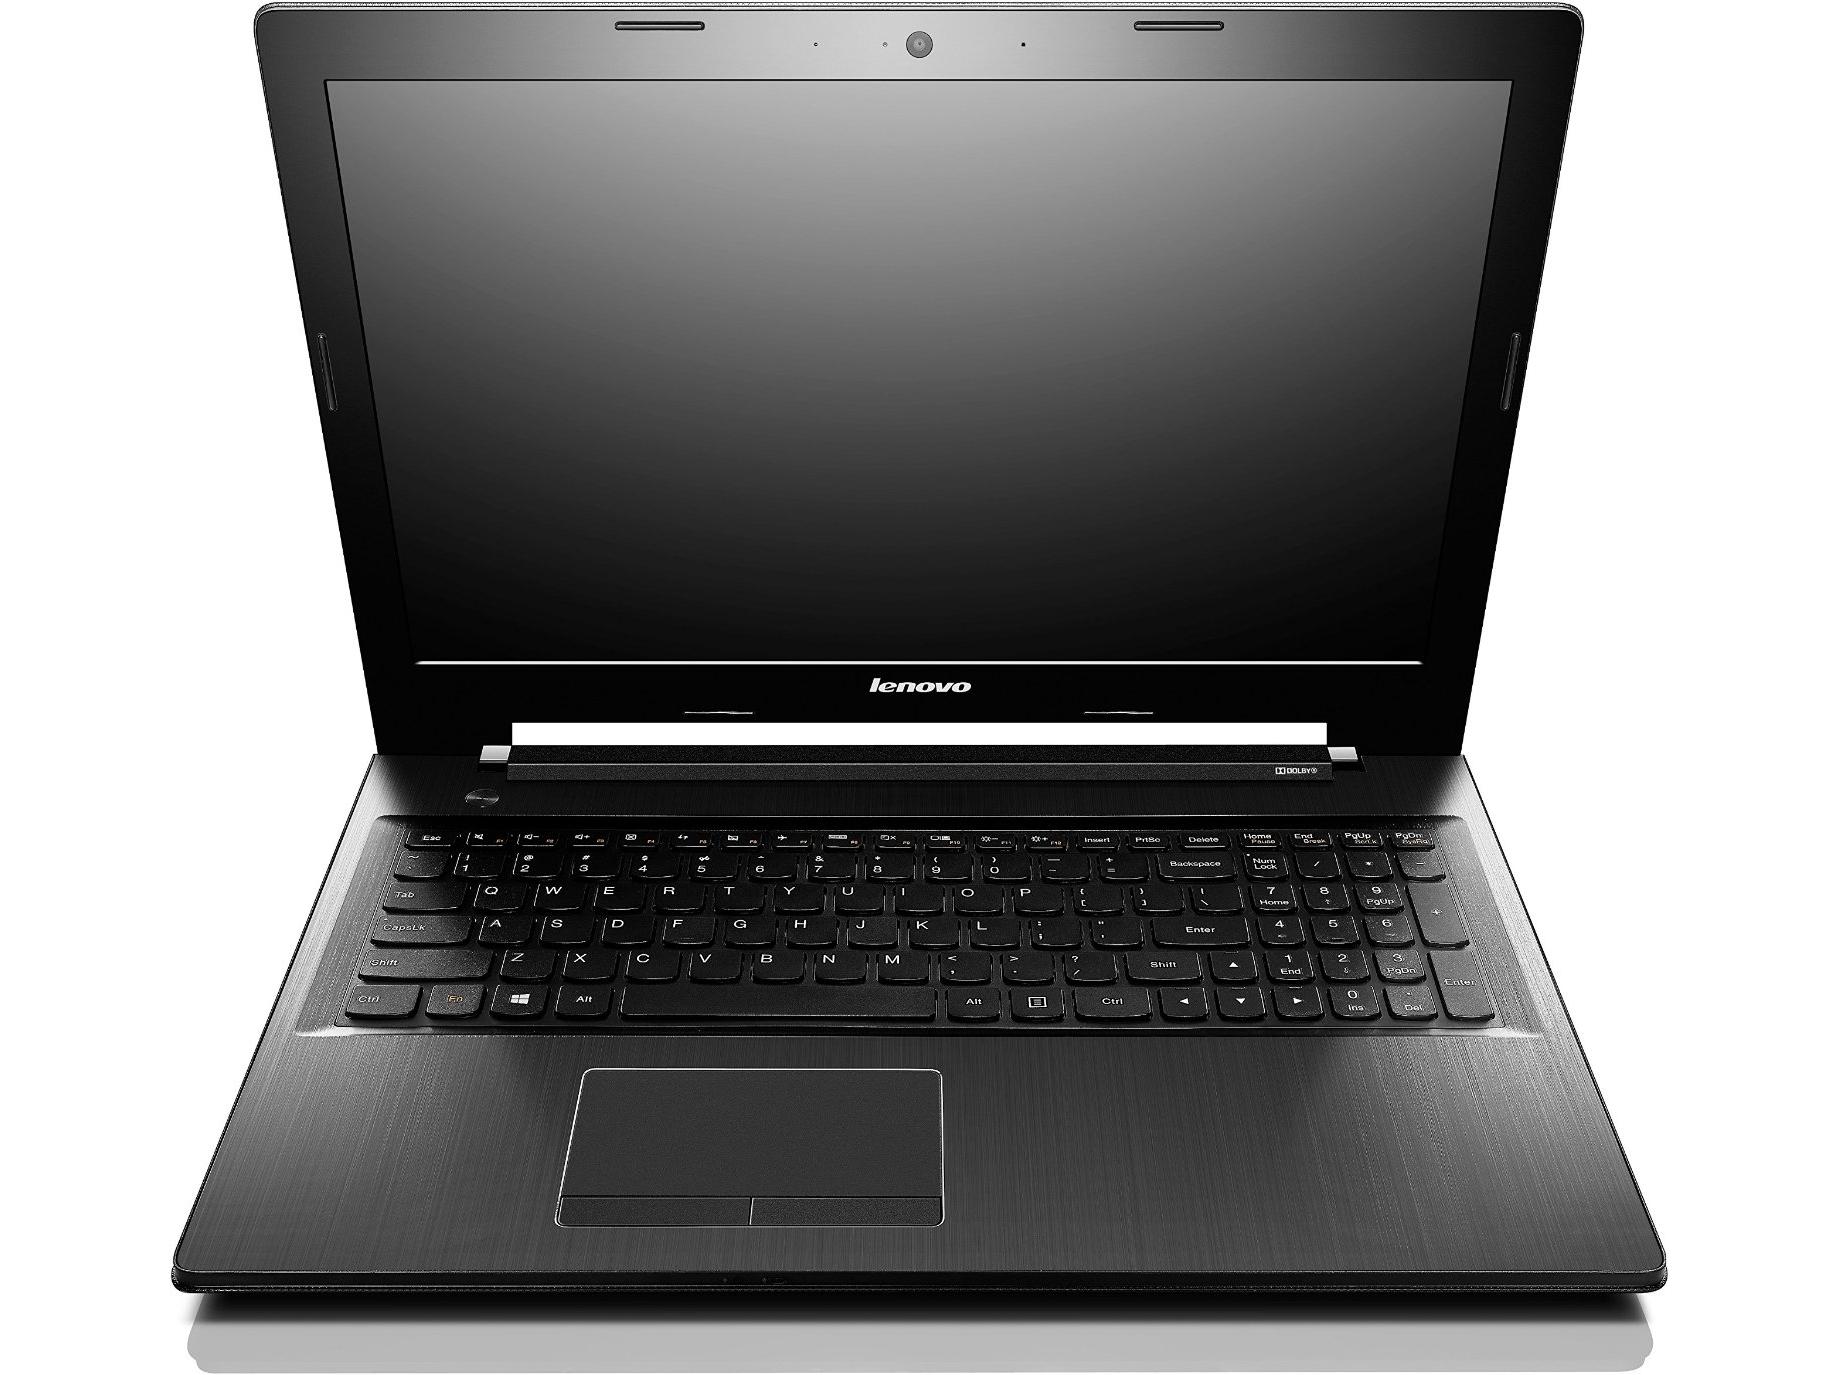 Lenovo Z40-70 Elantech Touchpad Driver